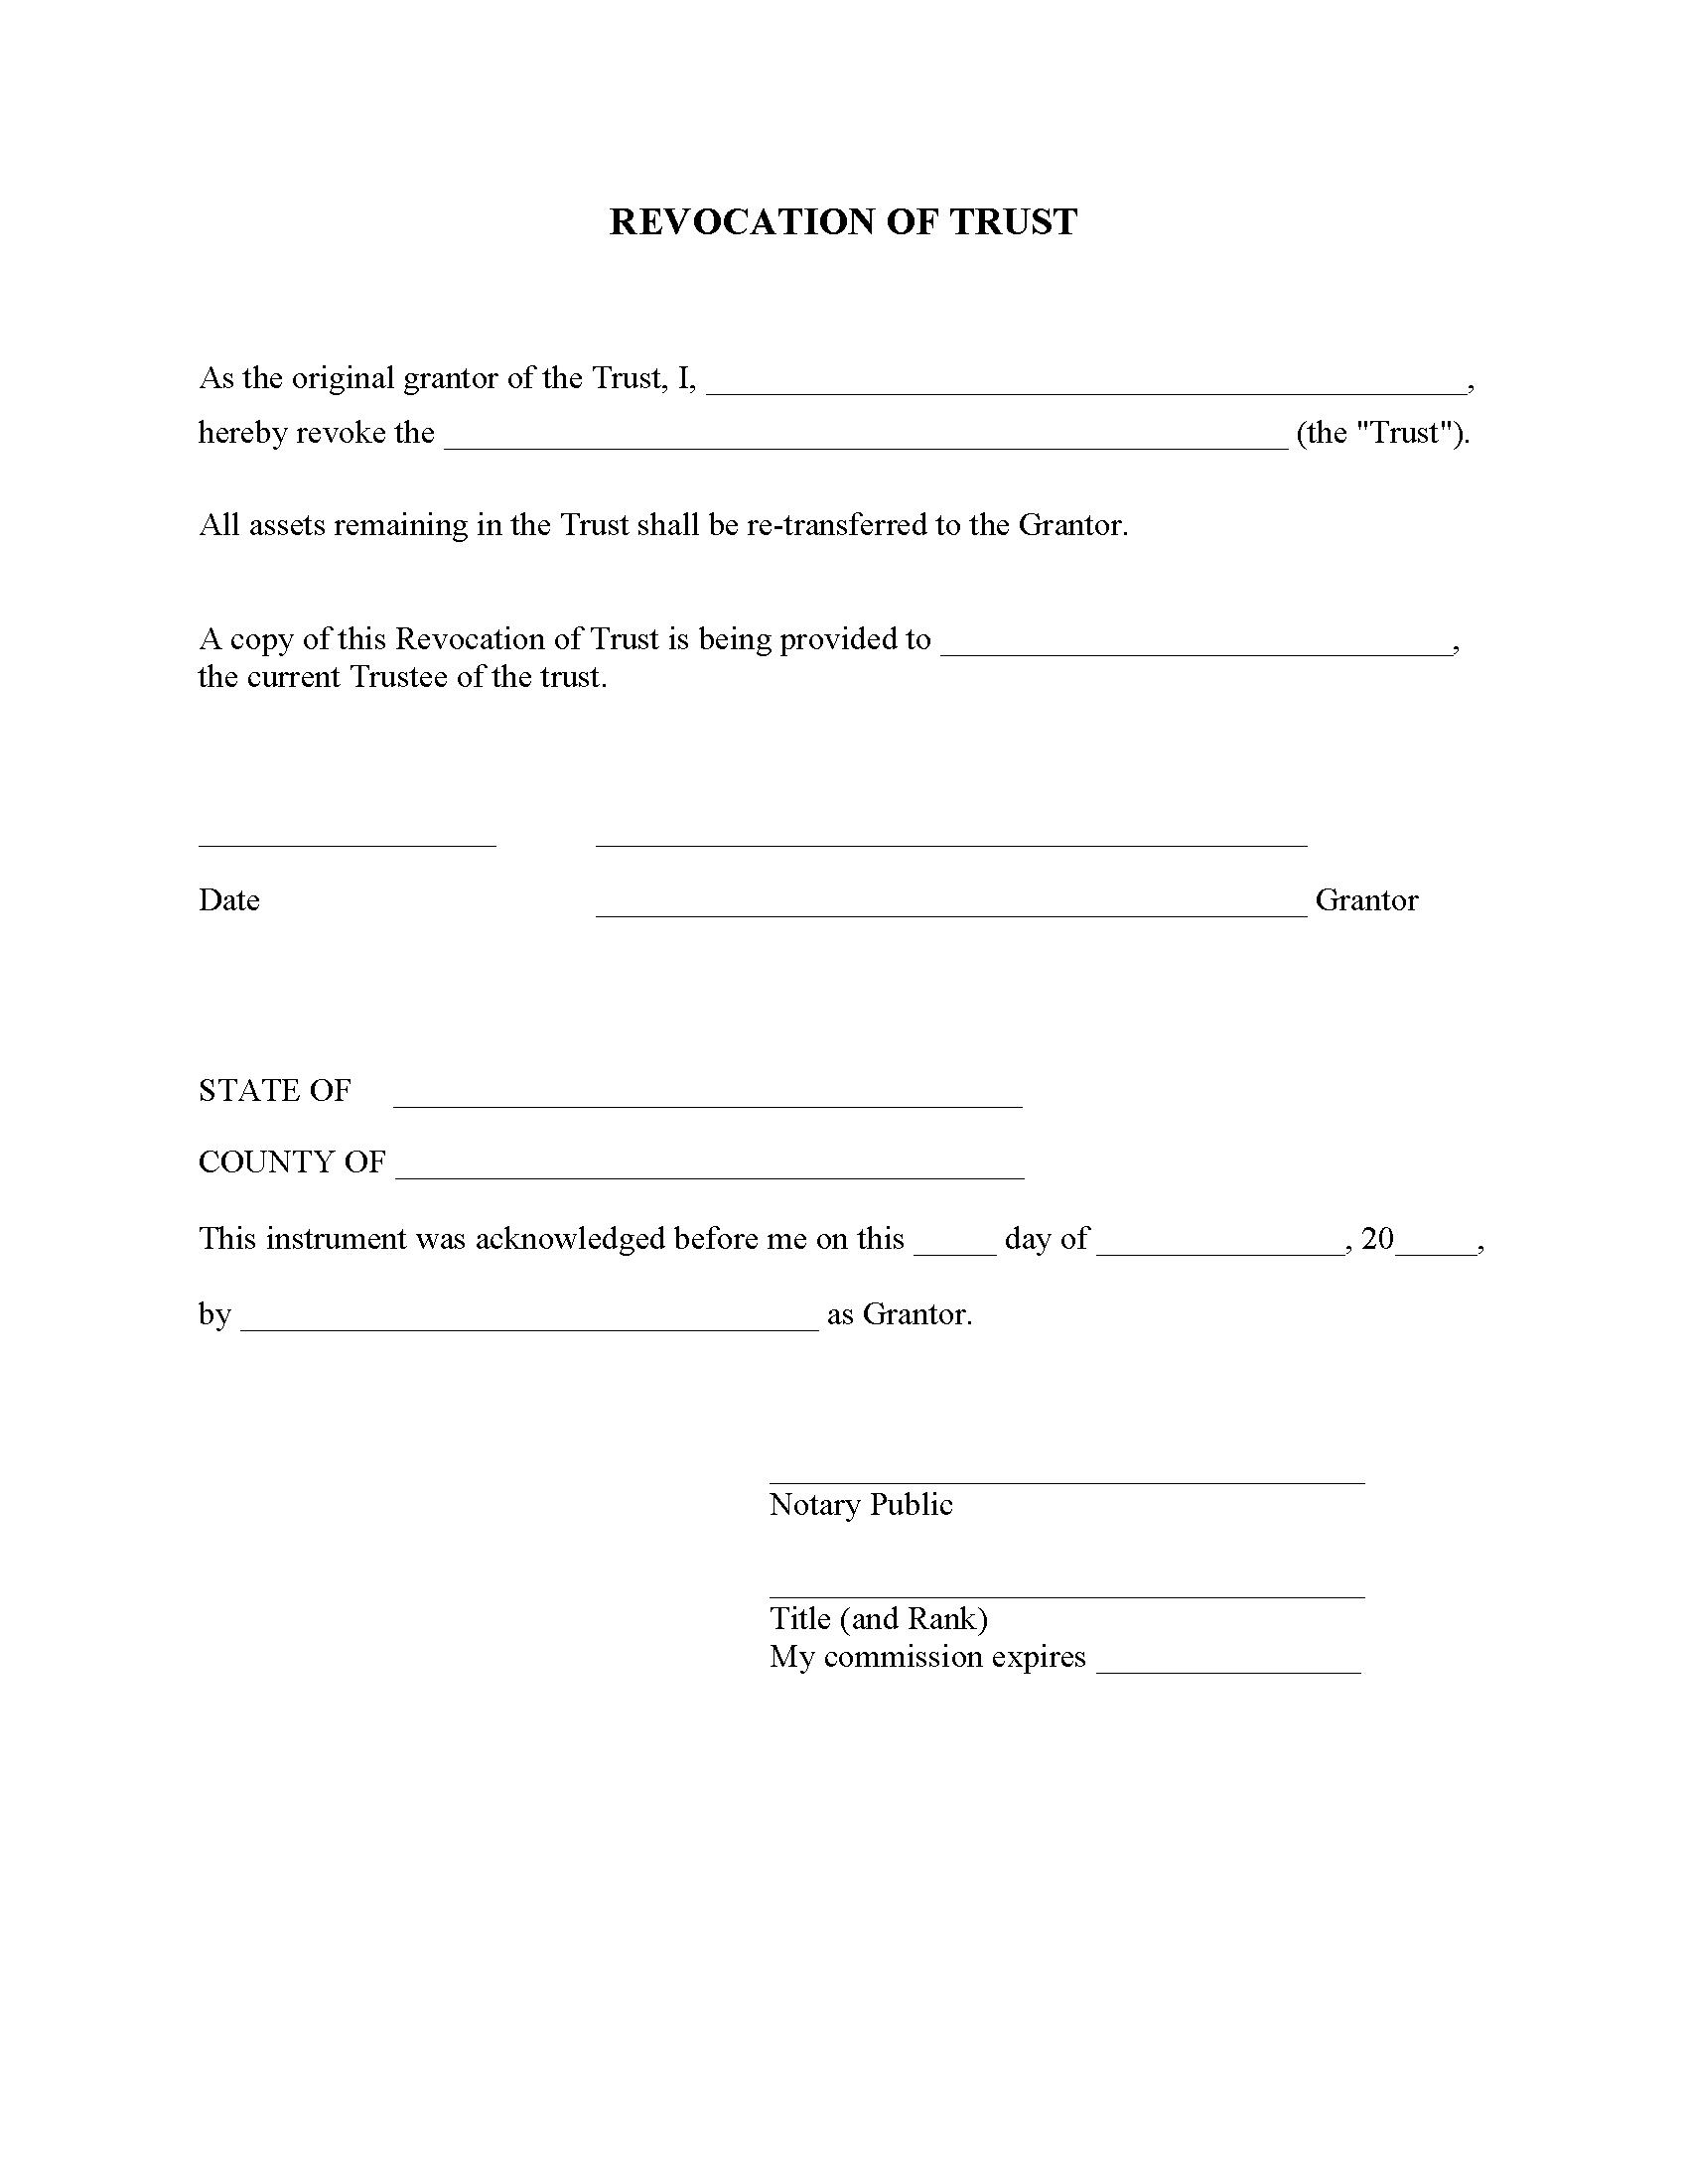 Texas Revocation of Trust Form